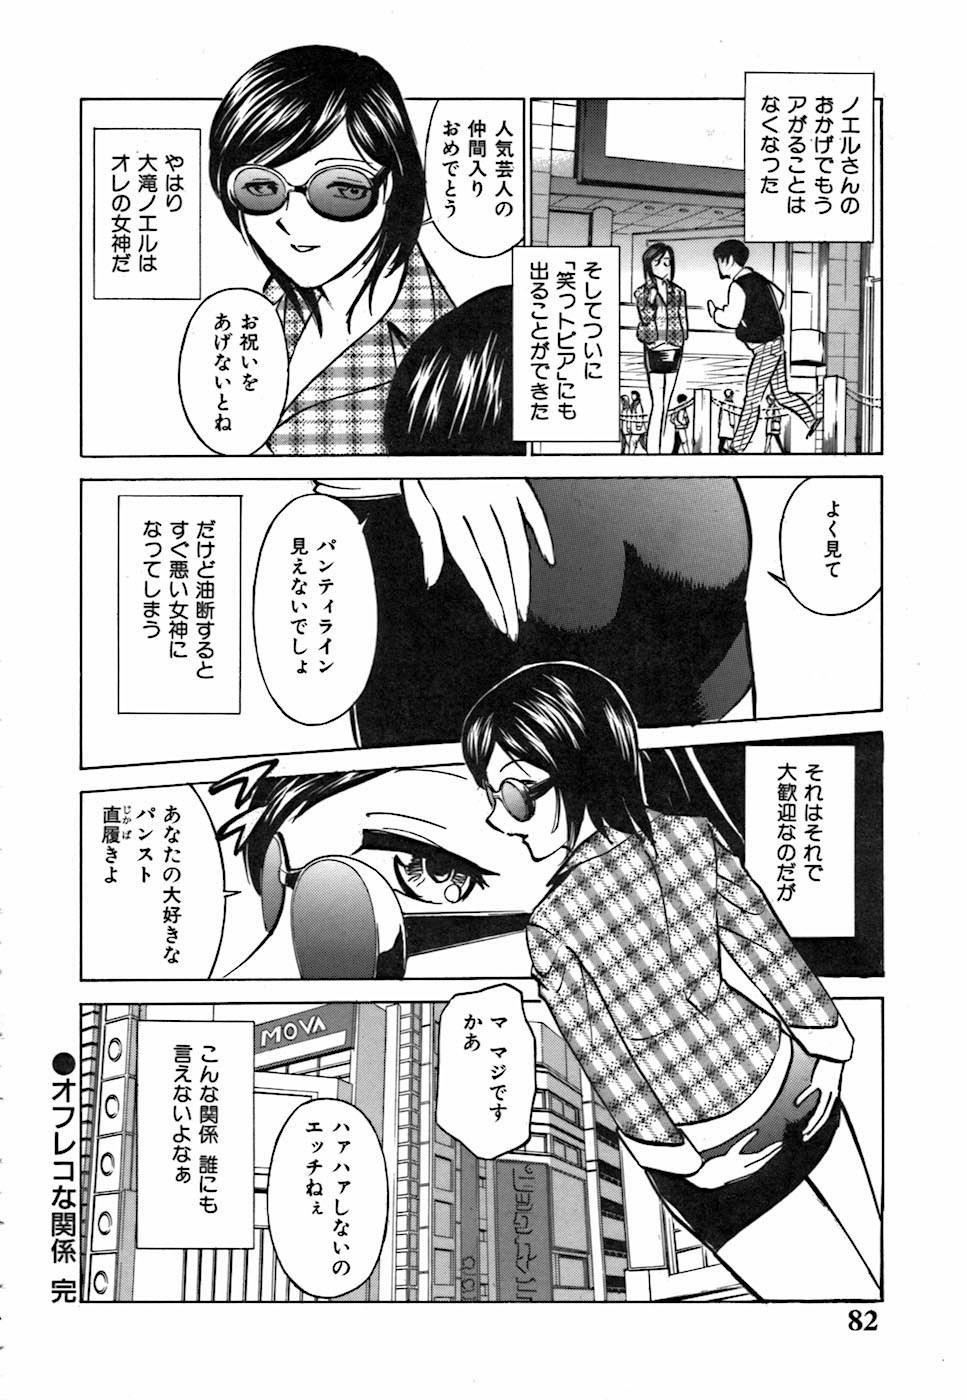 Kimi ga Nozomu Katachi | Appearance for which you hope 81